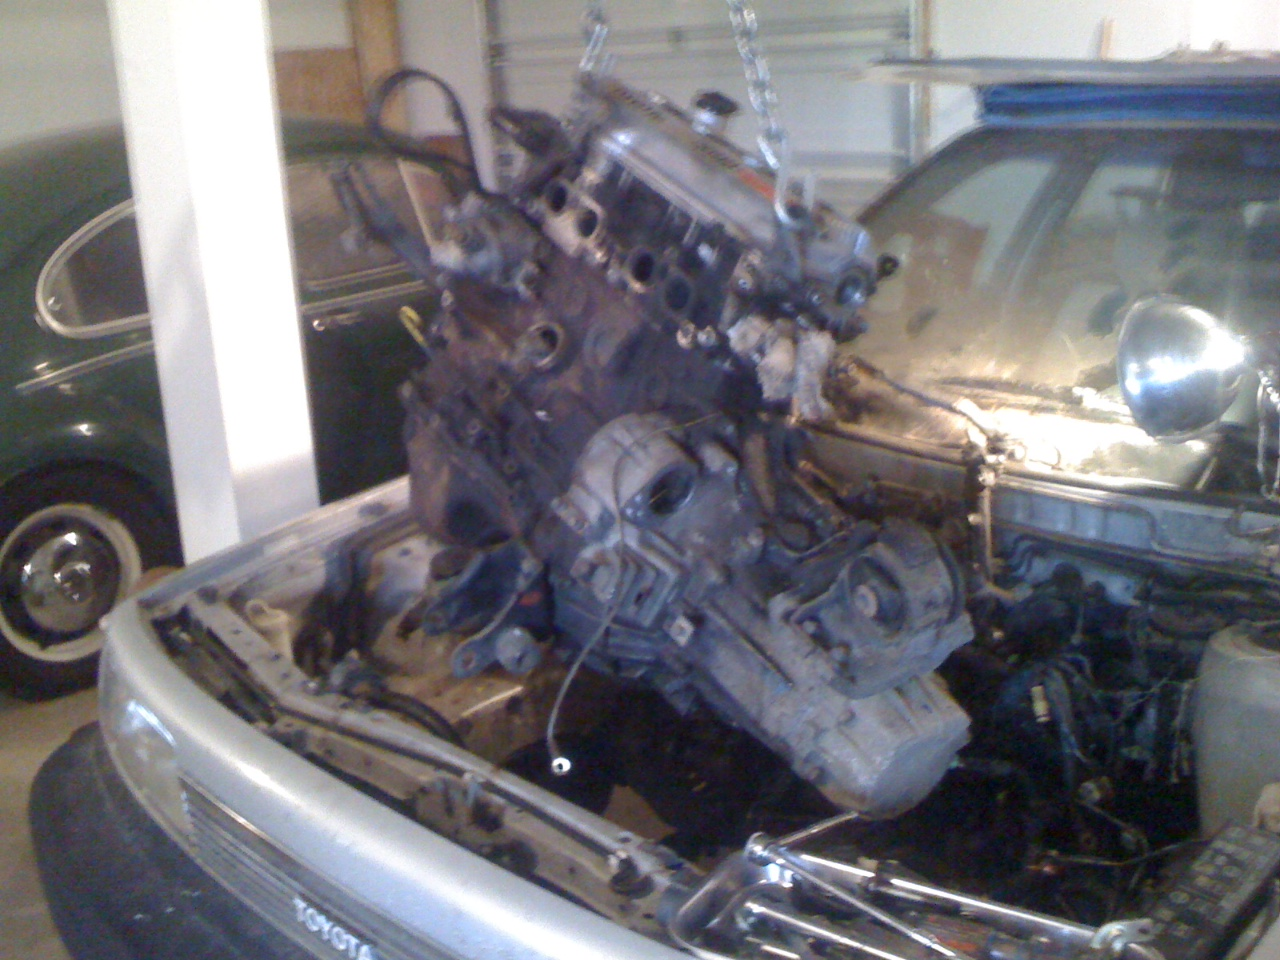 U0026 39 88 Camry 3sfe   The Saga Continues  Day 2 Of Engine Swap